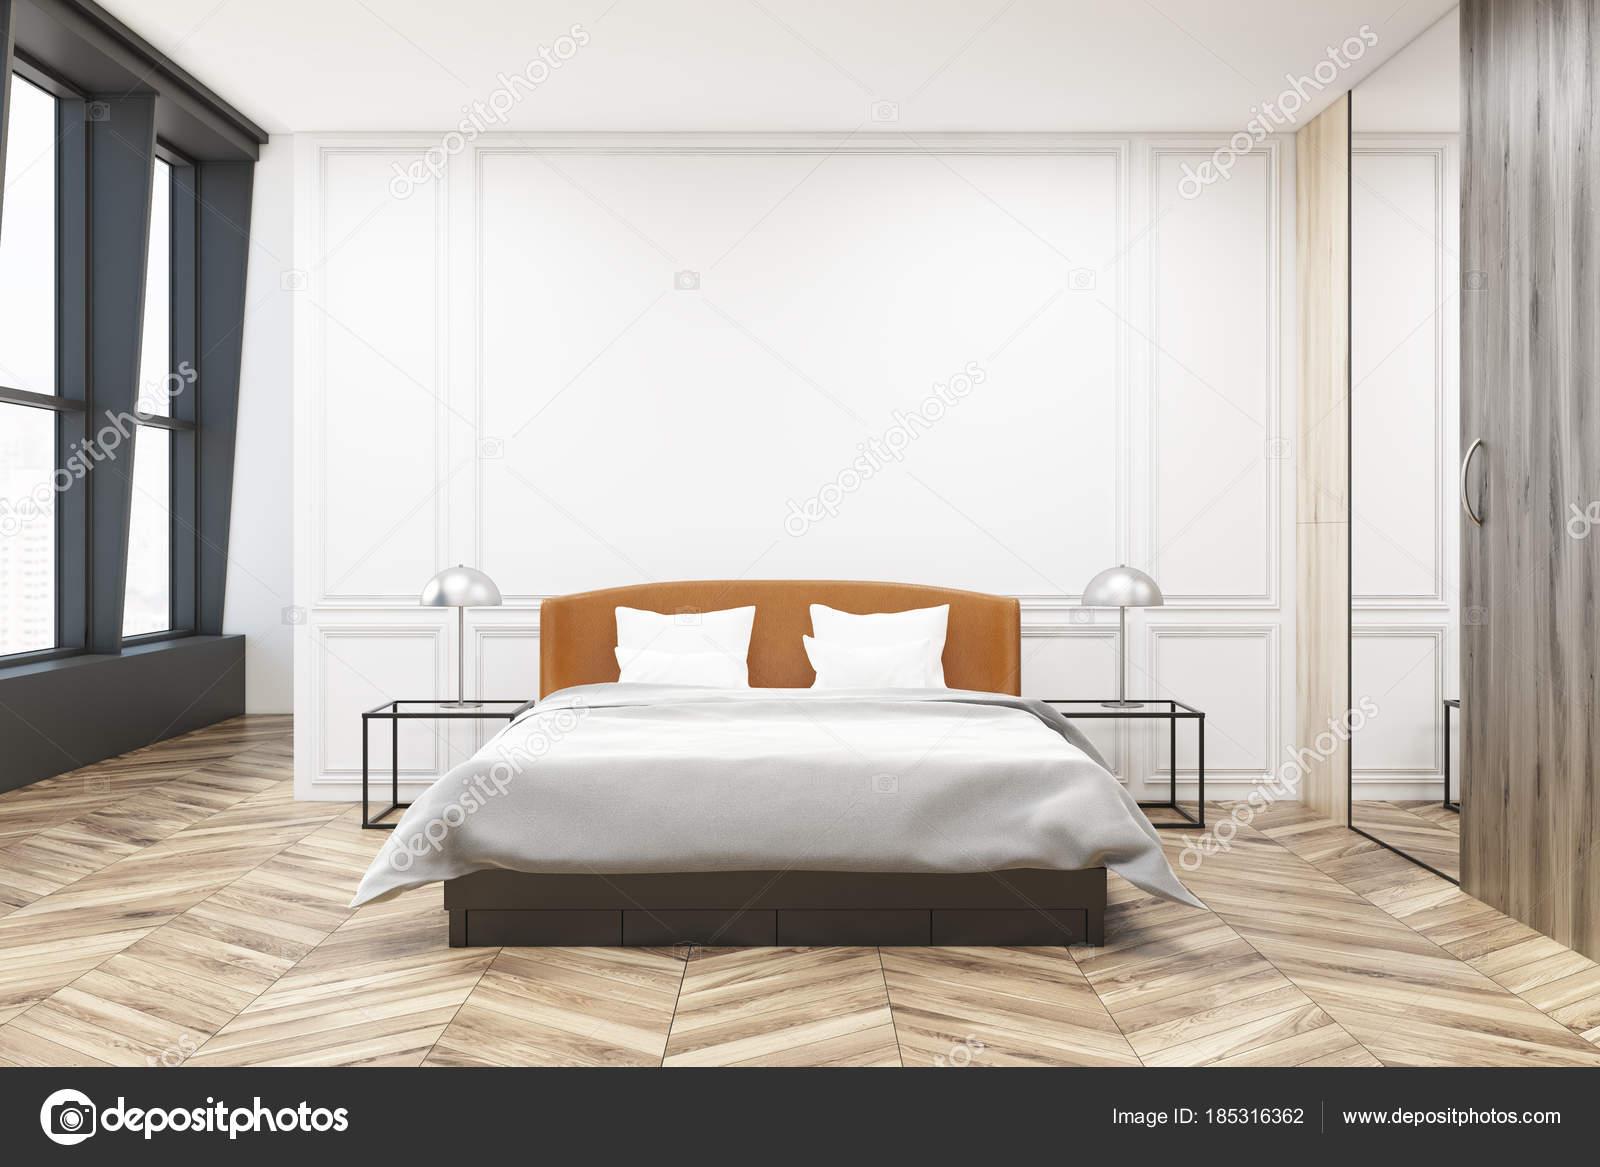 Slaapkamer Met Kledingkast : Stijlvolle slaapkamer interieur kledingkast u stockfoto